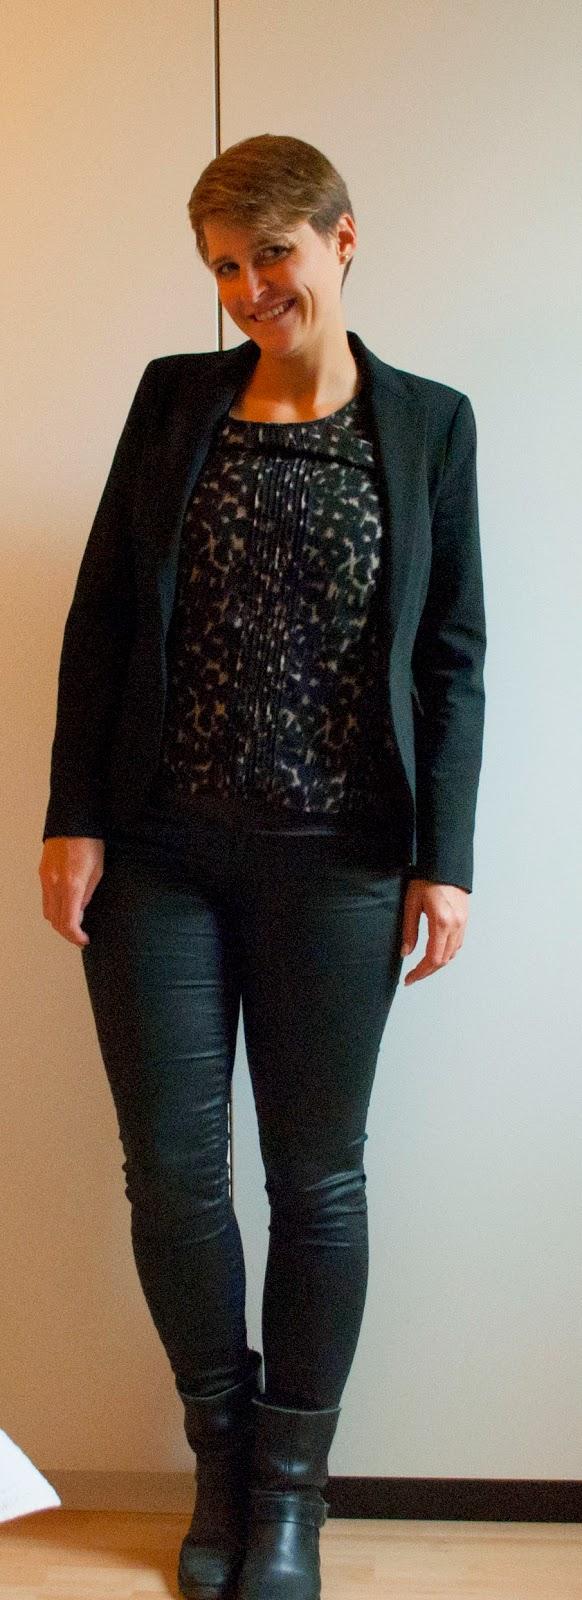 OOTD_15.07.2014 Outfit Fashion Mode Dresscode Office Büro Mode Hupsis Serendipity